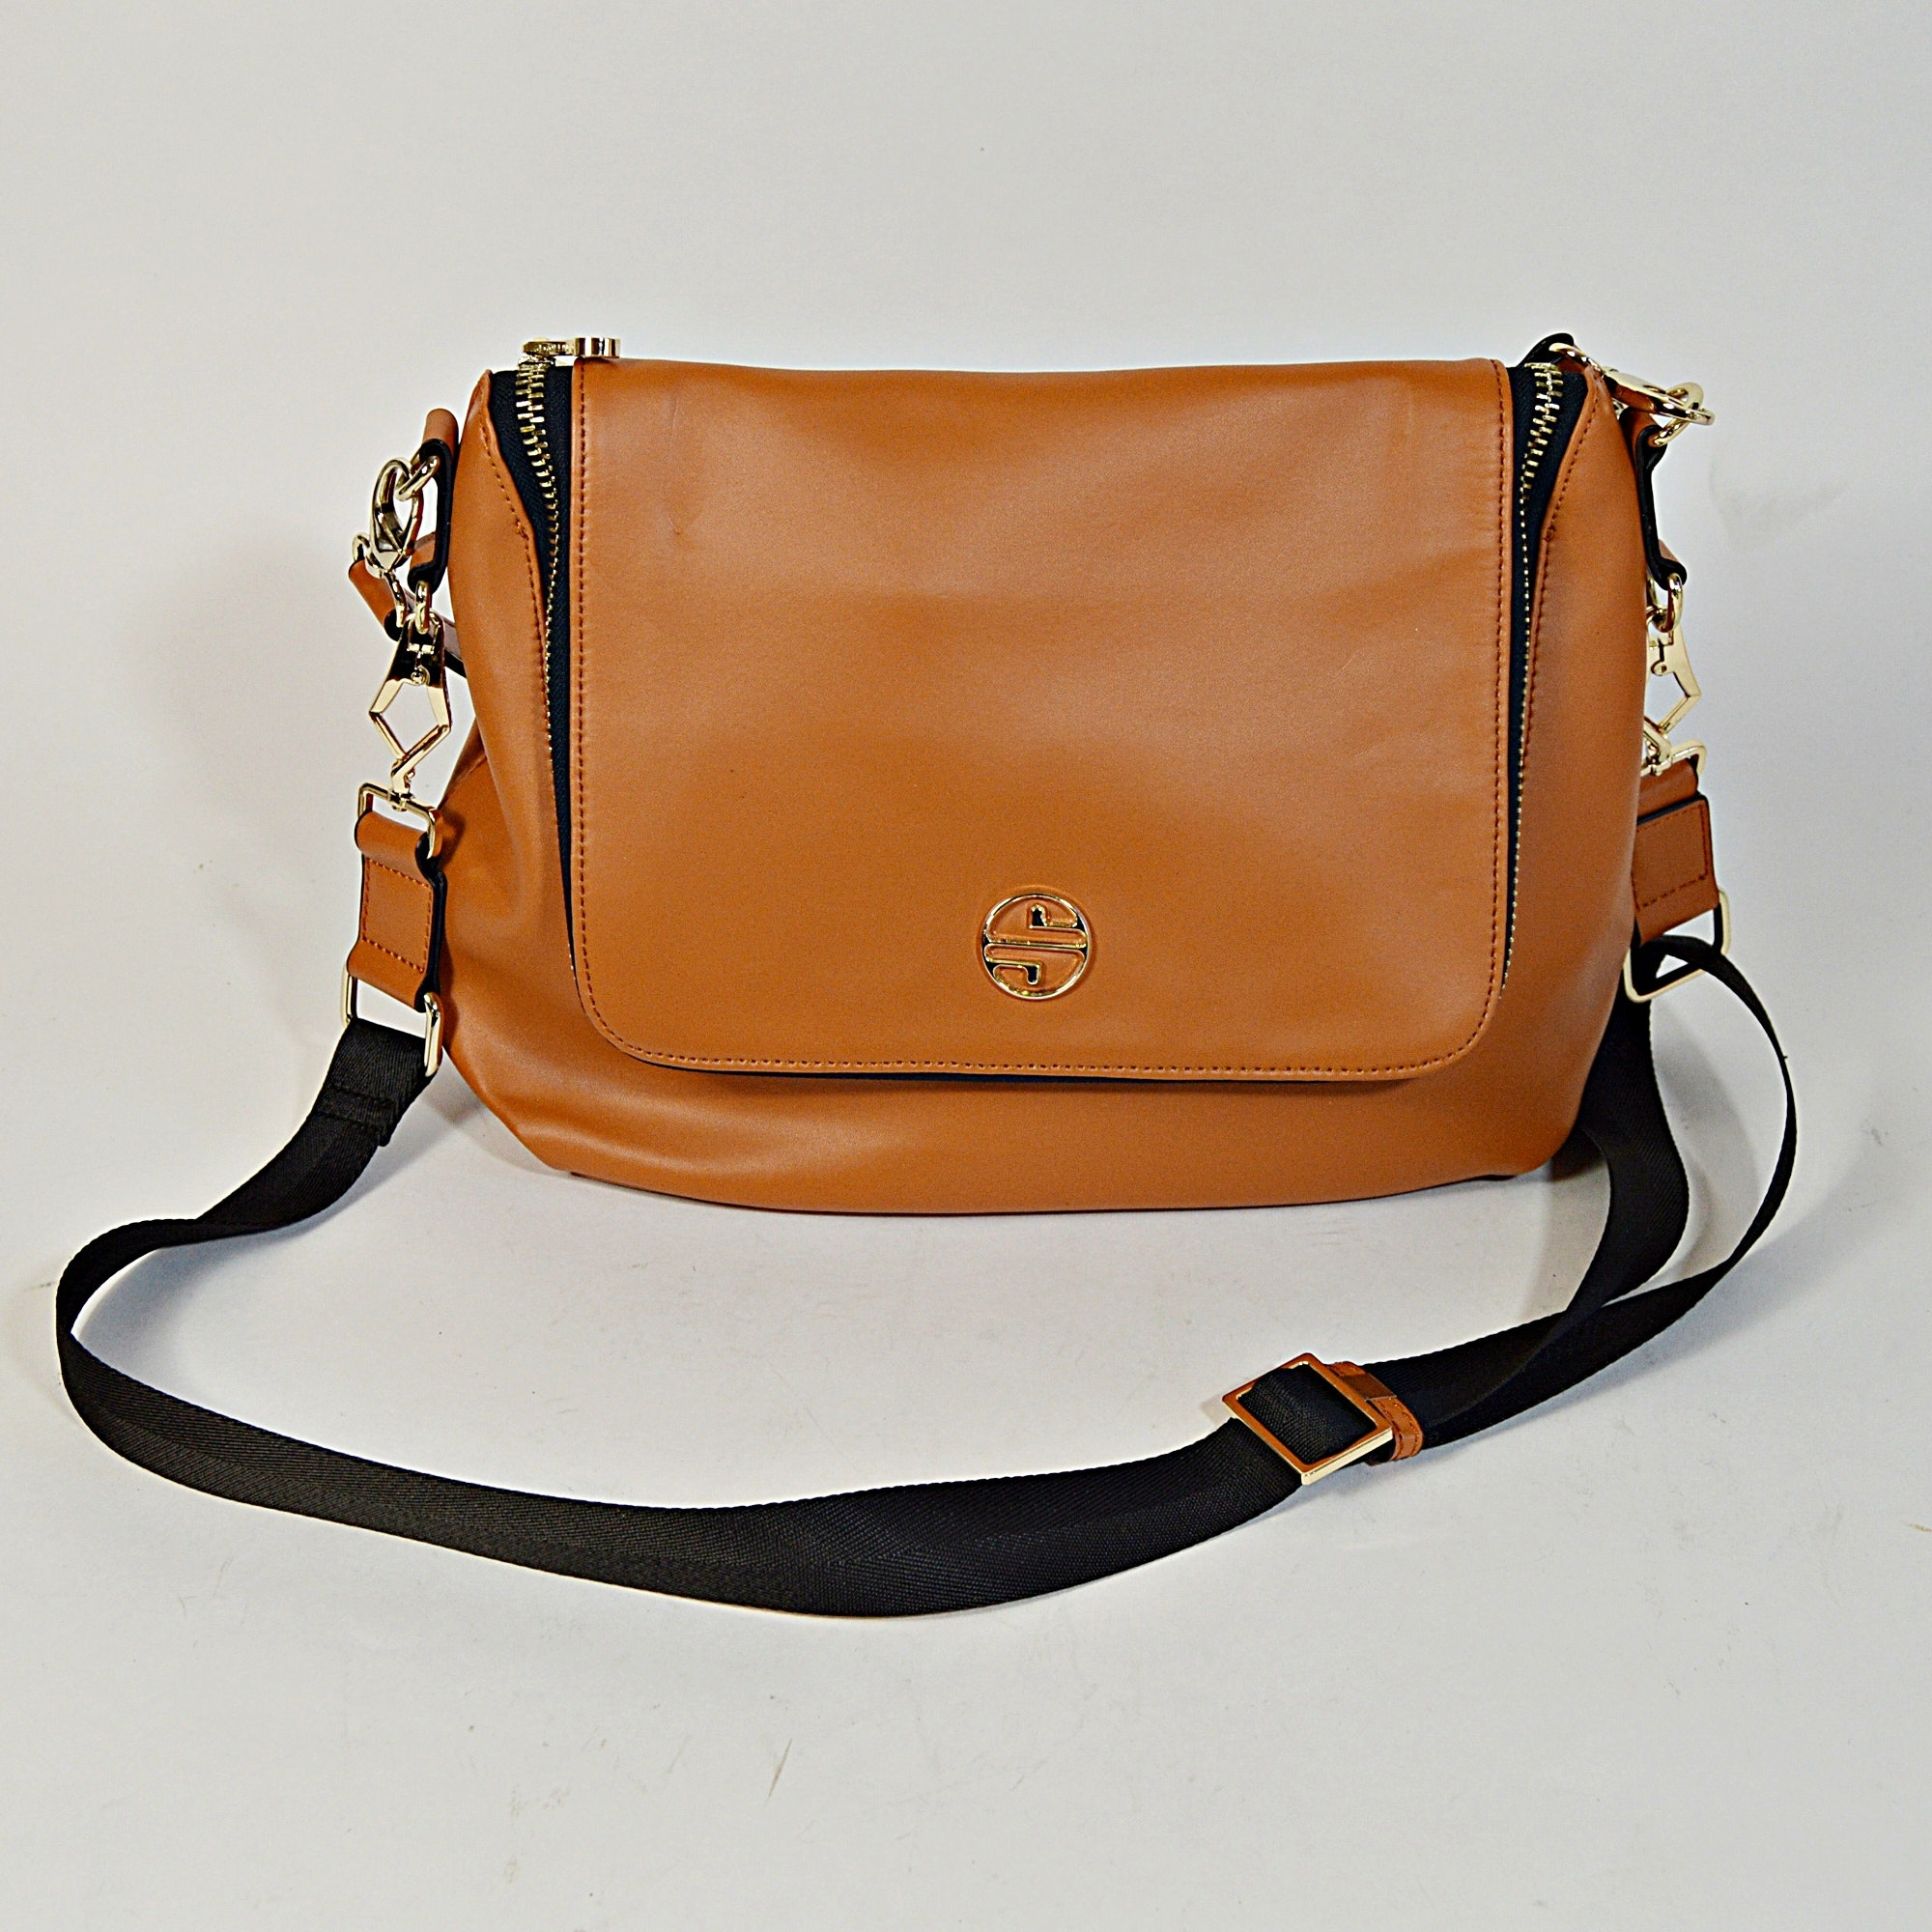 Segolene en Cuir Leather Handbag, New-with-Tags